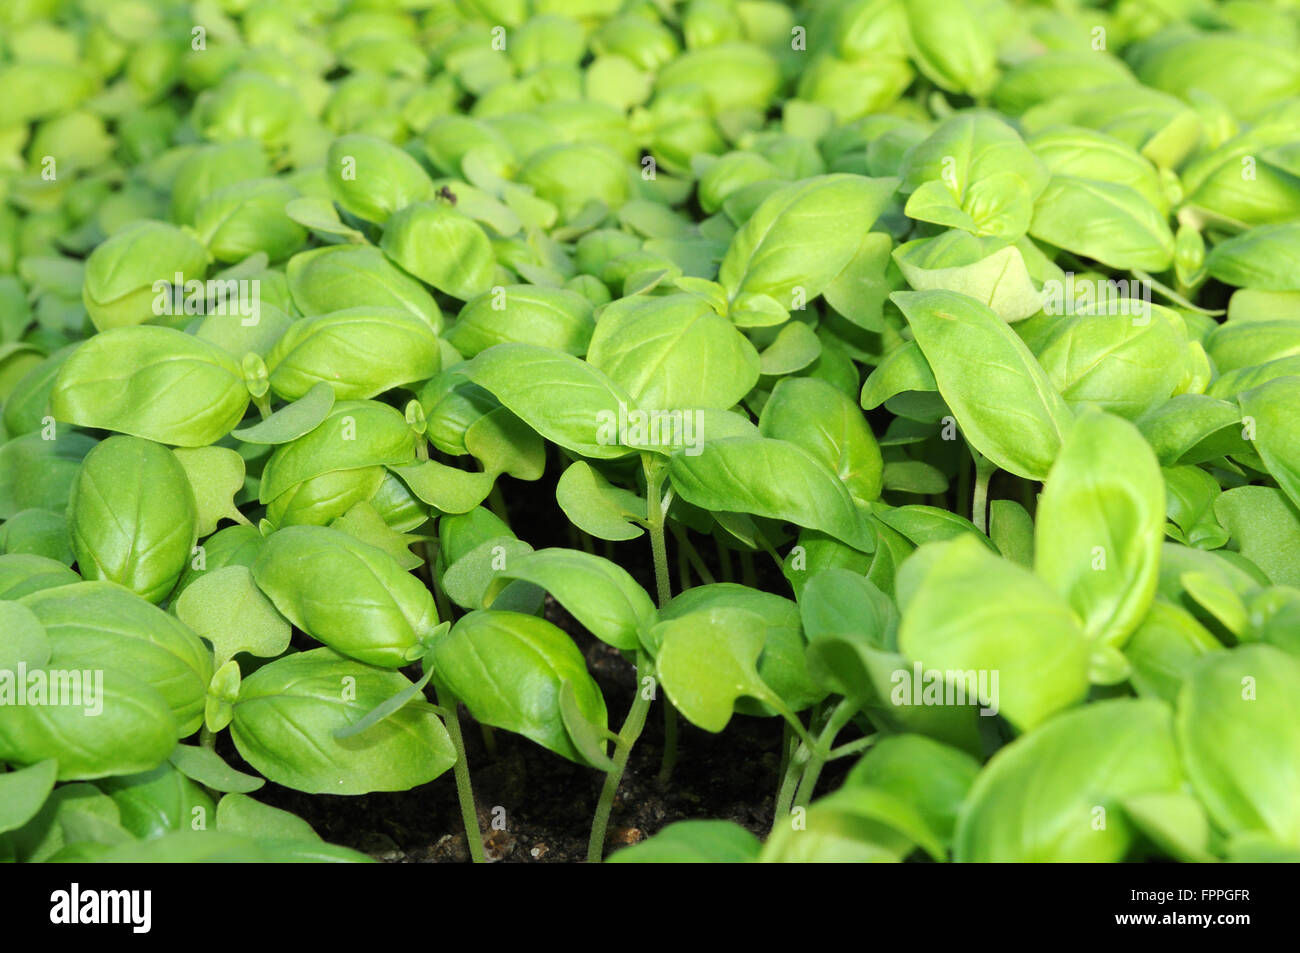 The greenhouse pr - Traditional Ligurian Basil Growing In The Greenhouse Pr Village Genoa Ligury Italy Europe